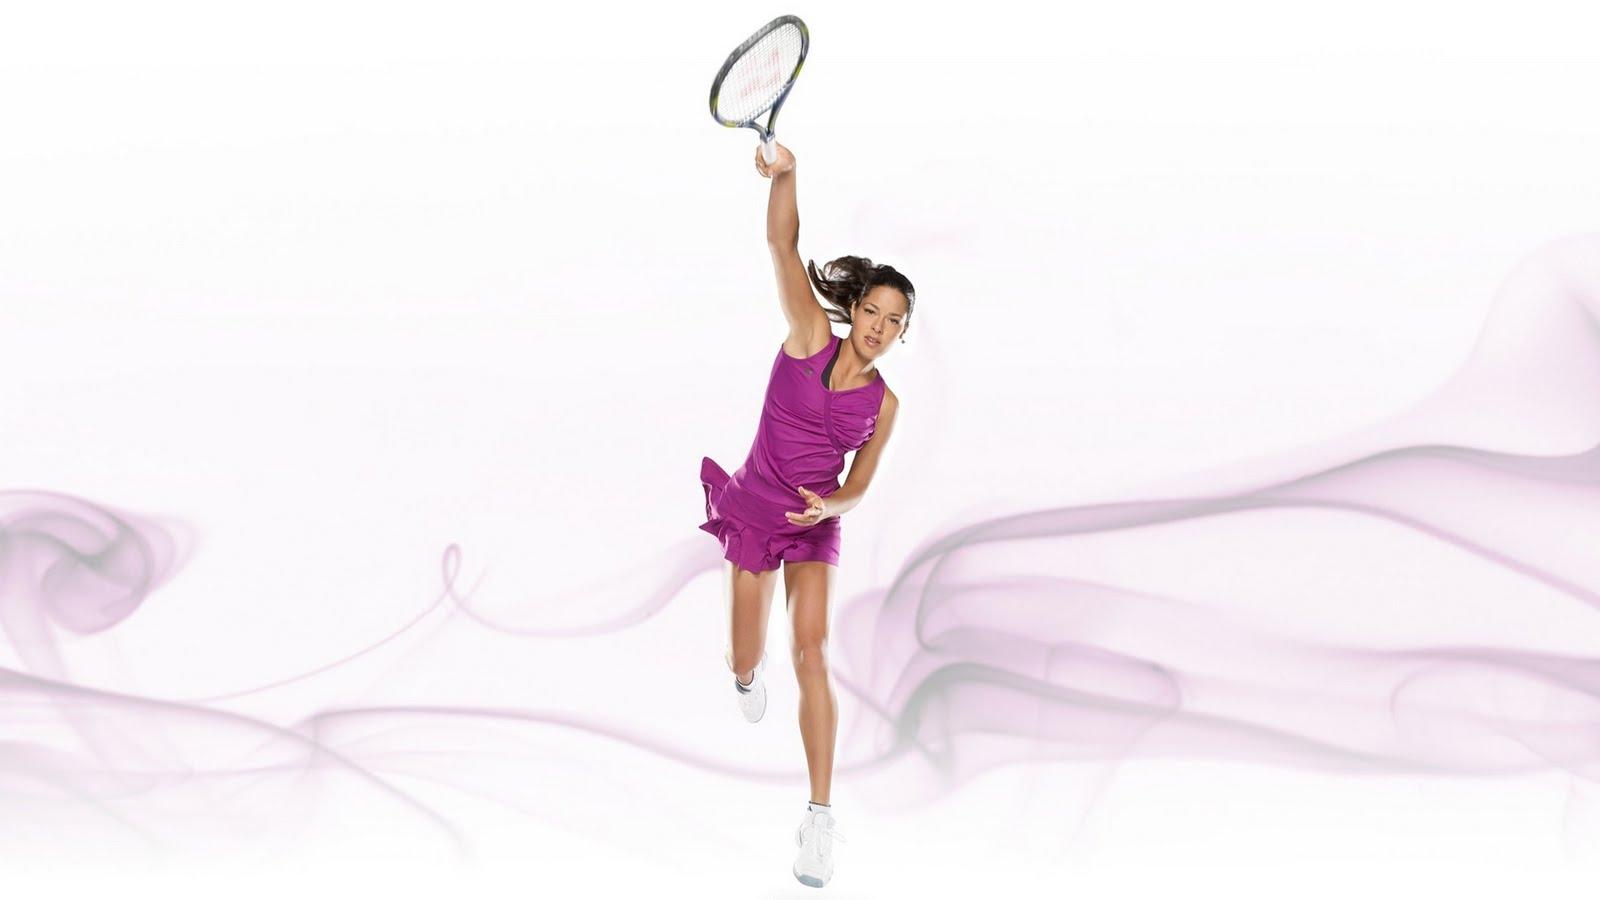 Free Wallpapers 1920x1080 HDTV: Ana Ivanović, tennis